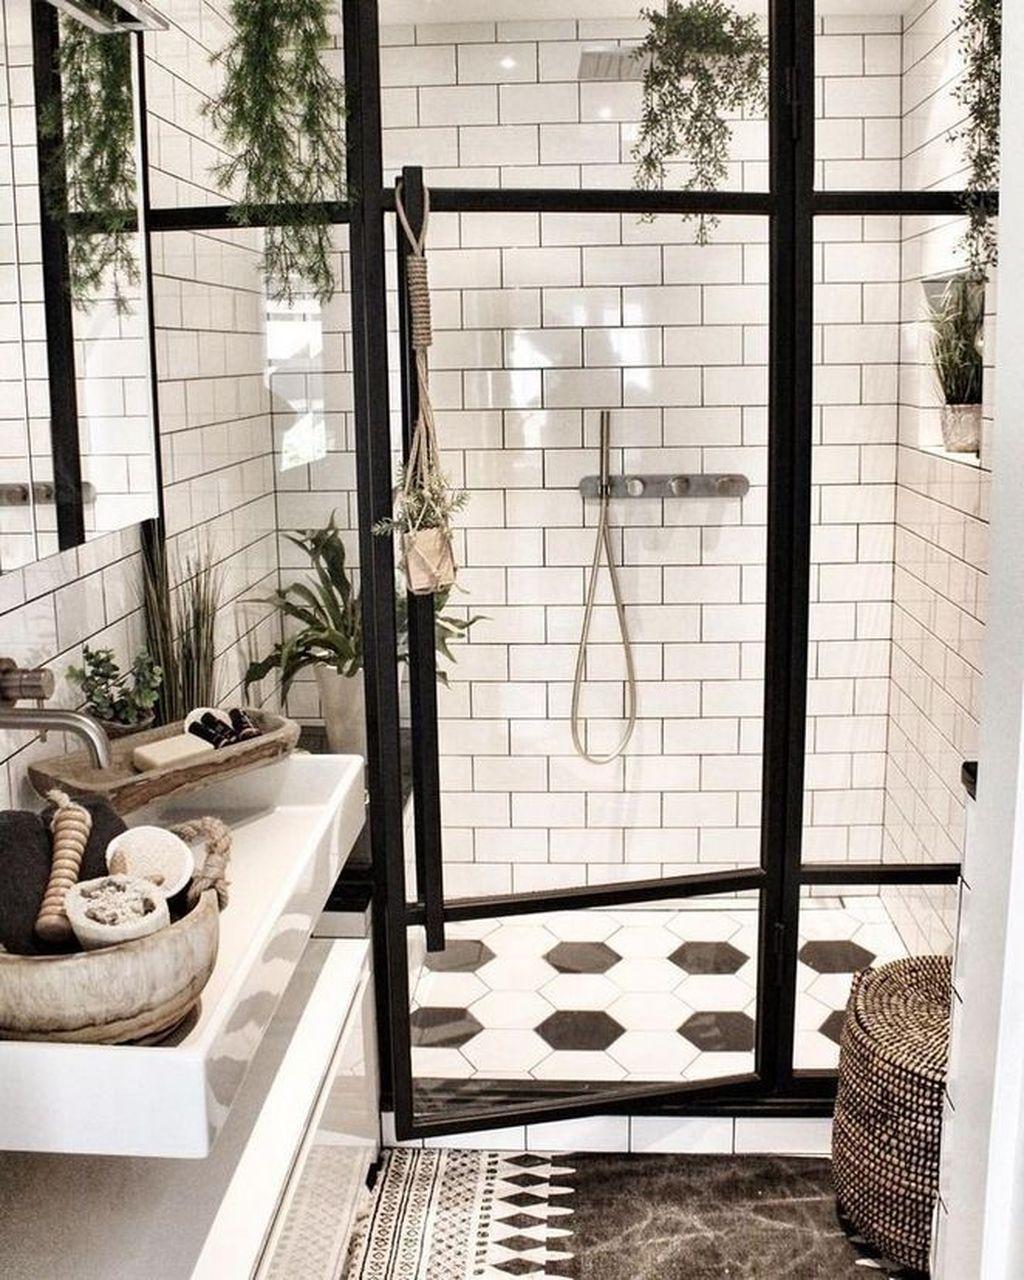 Inspiring Bathroom Tile Ideas 11